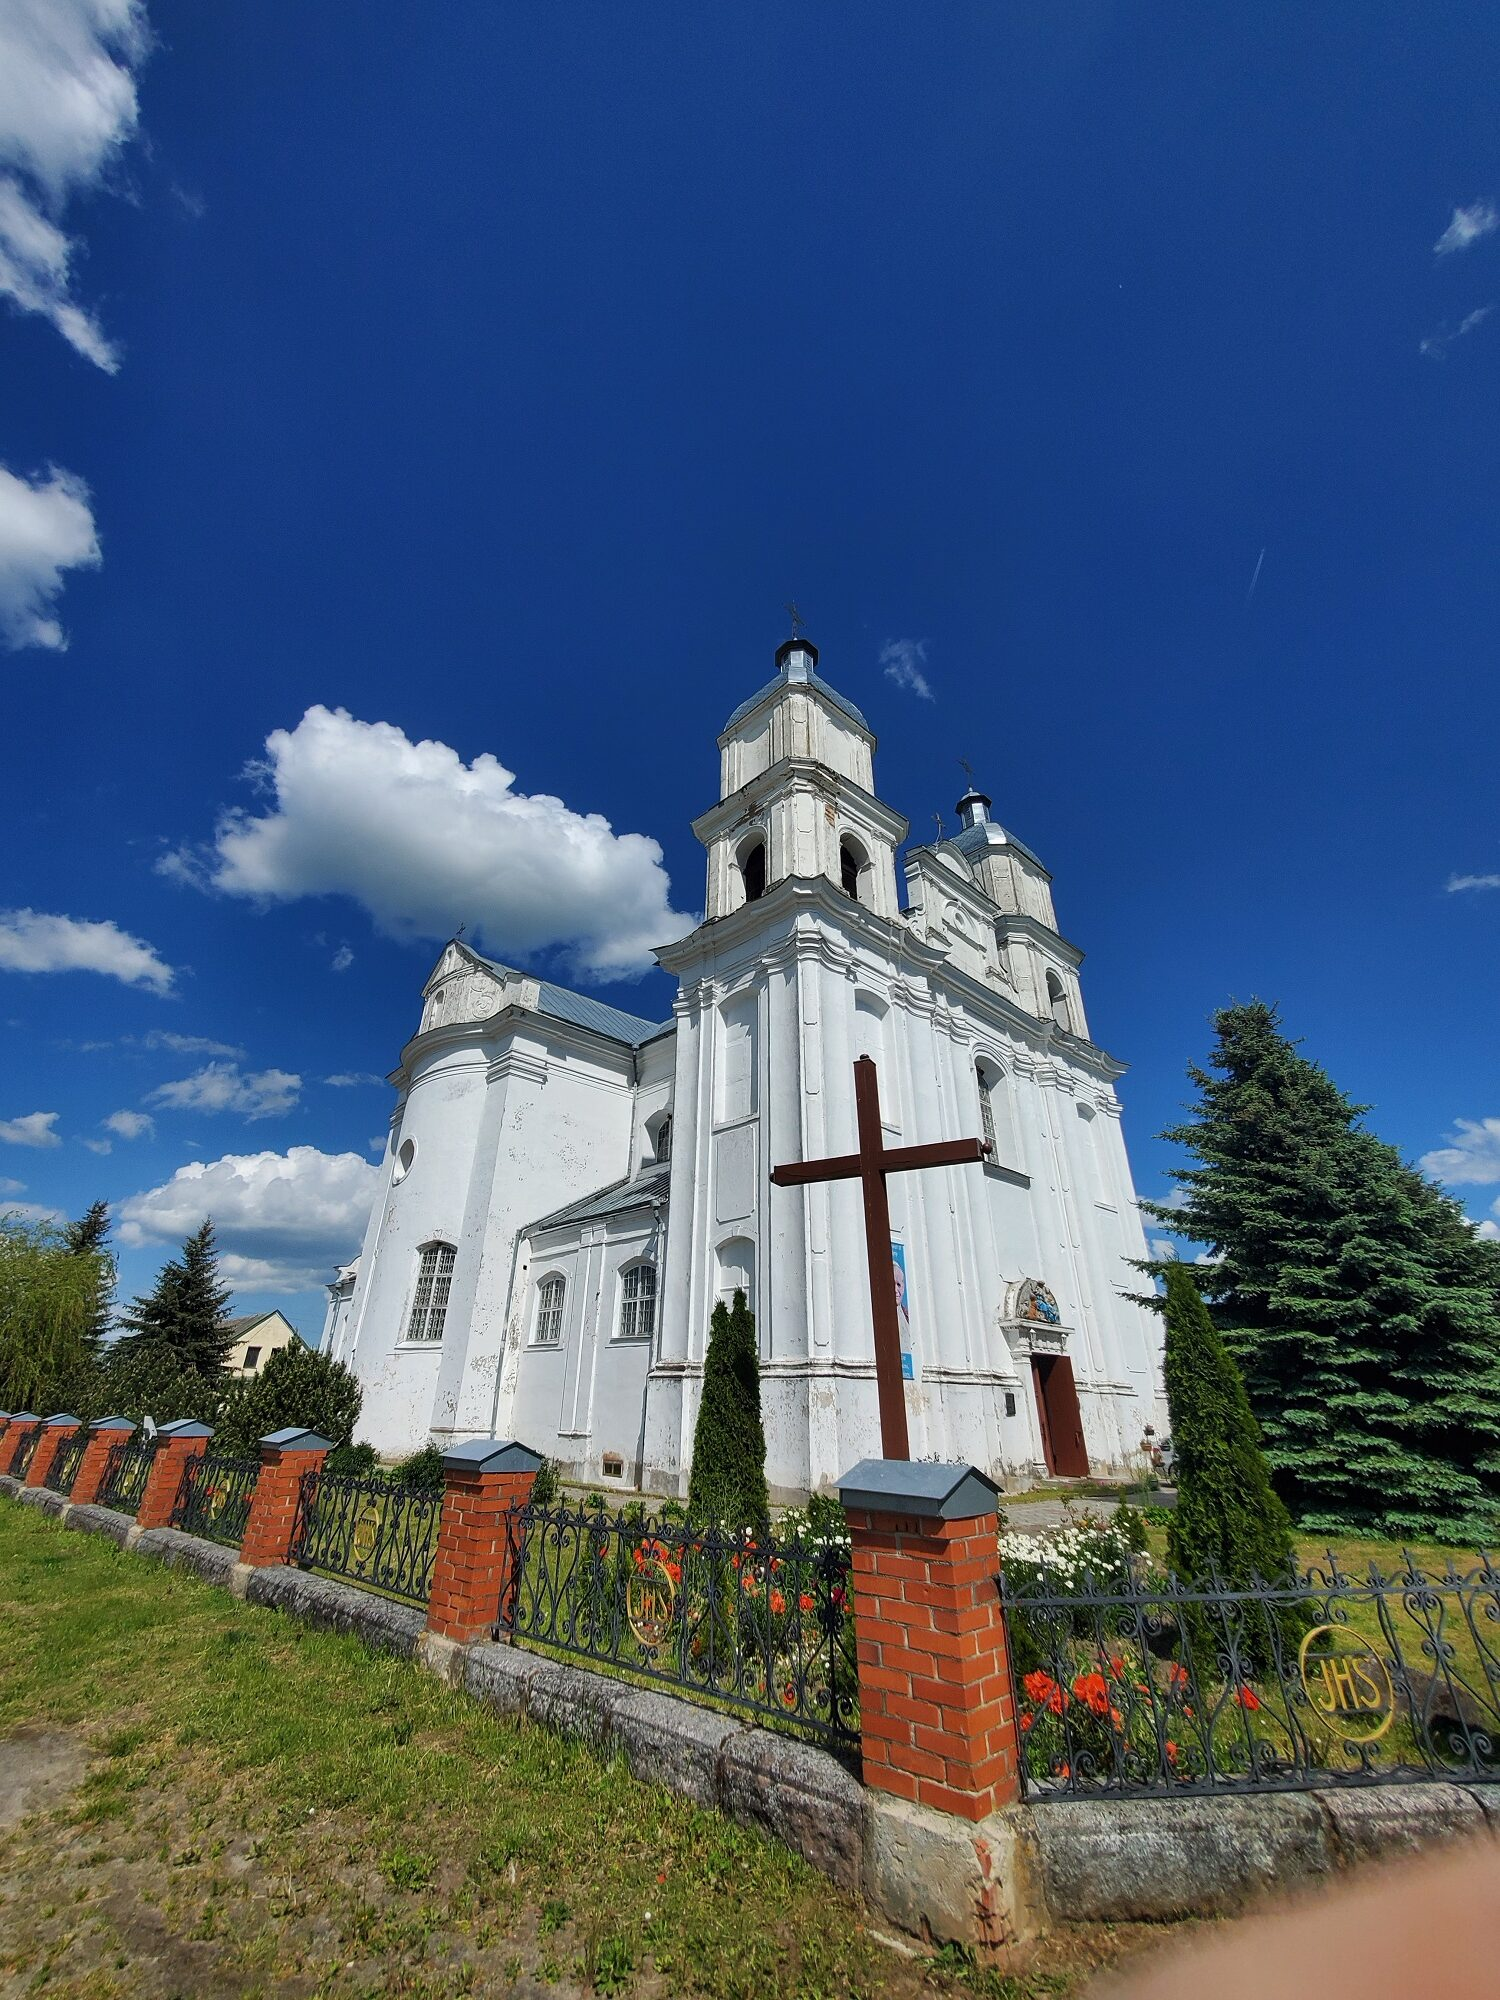 20200606 150934 rotated - Костел Святой Троицы в деревне Дуниловичи